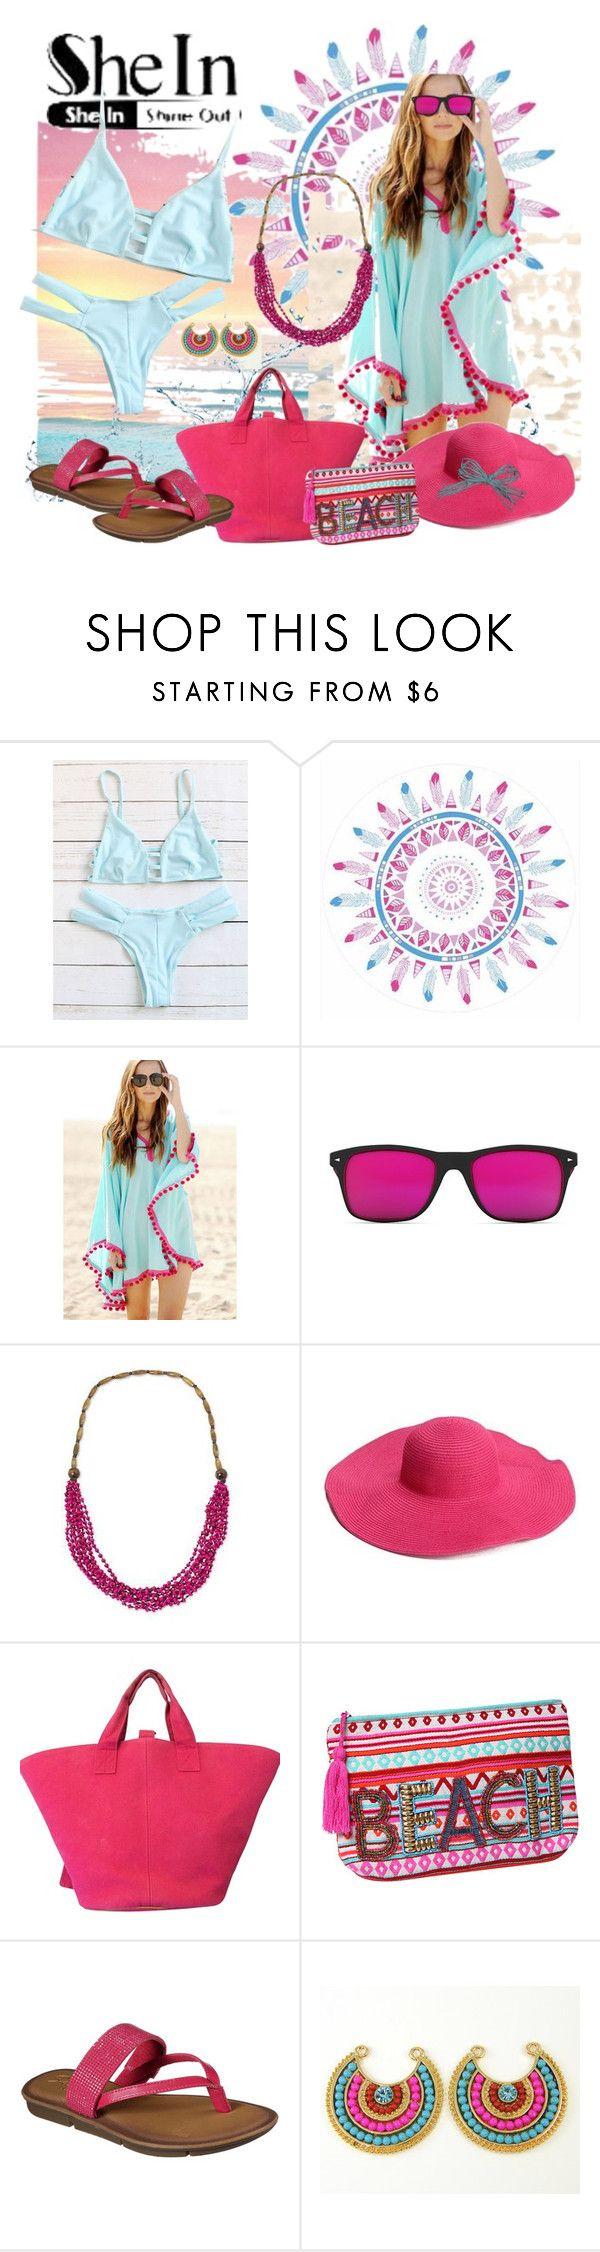 """www.shein.com/Blue-Cutout-Strappy-Sexy-Bikini"" by susan-993 ❤ liked on Polyvore featuring Isharya, GlassesUSA, NOVICA, Hermès, ále by Alessandra and Skechers"